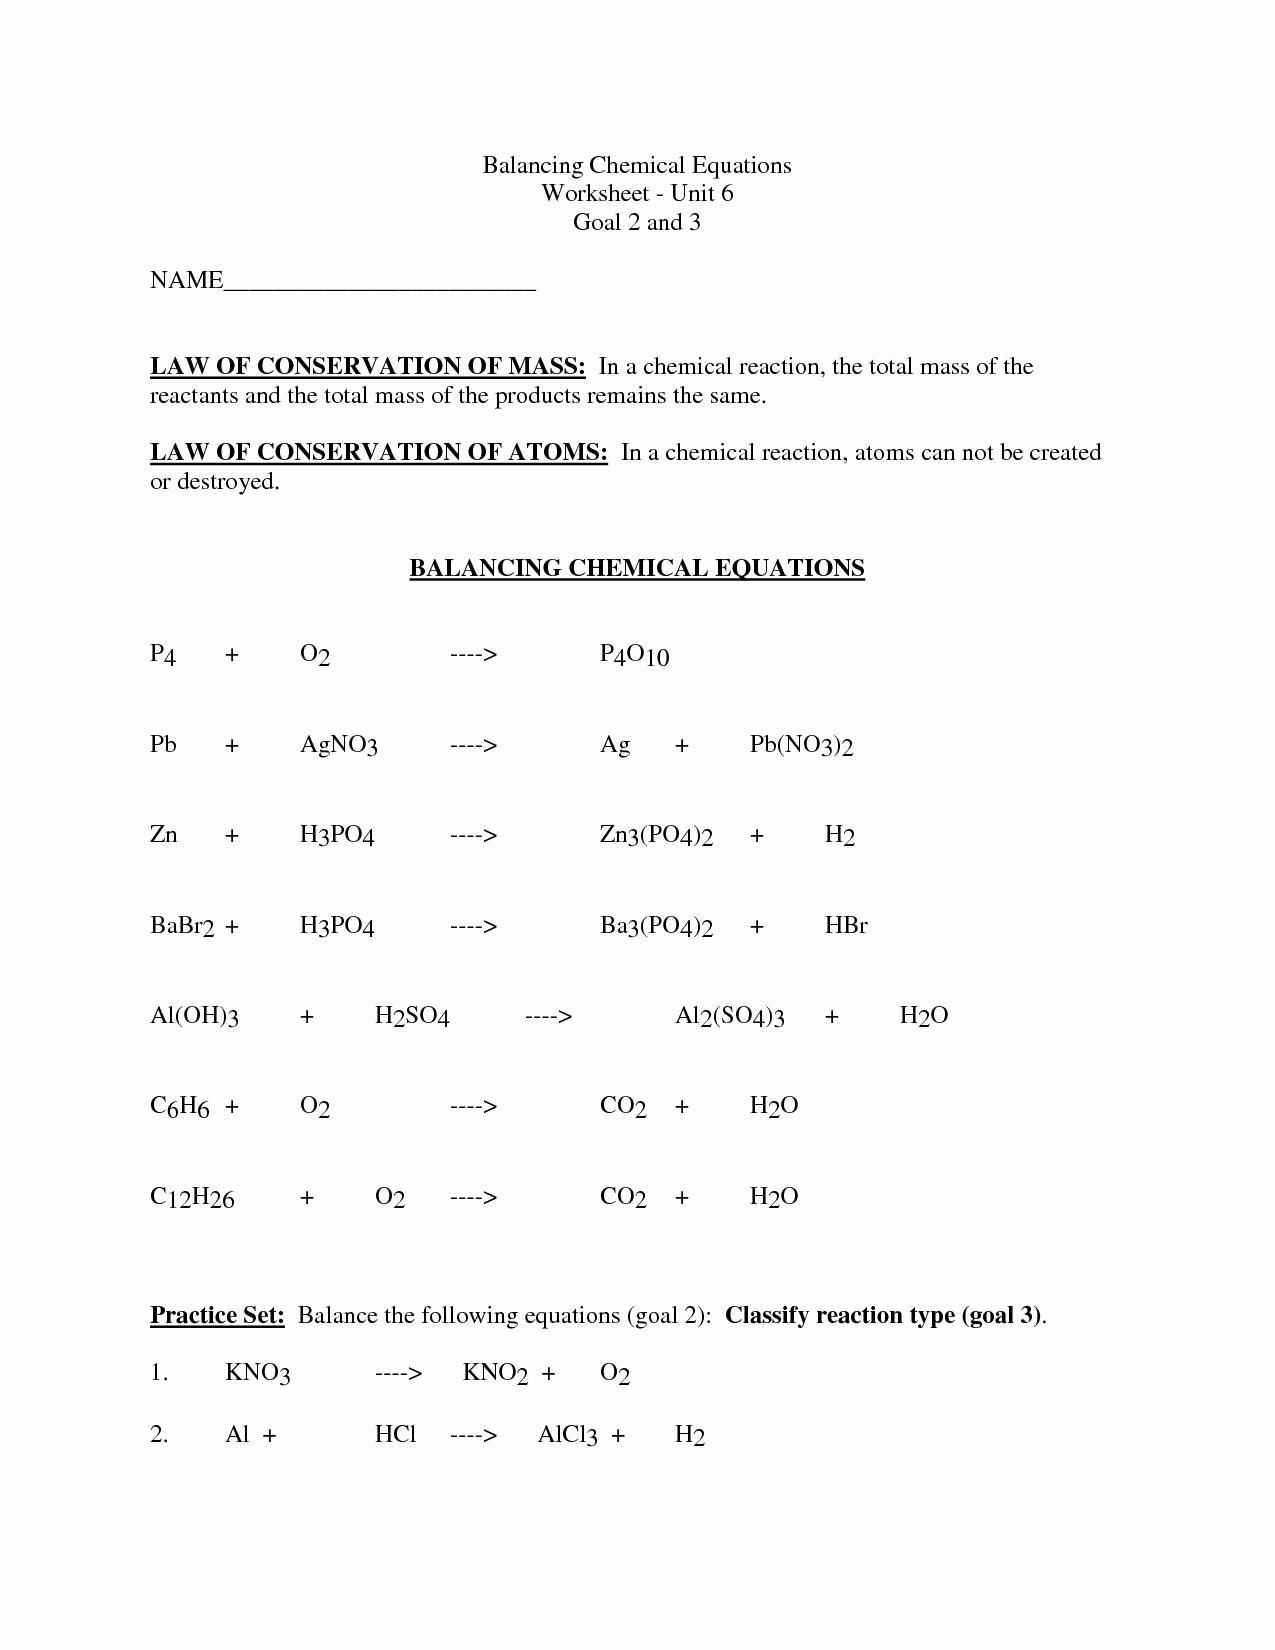 Balancing Chemical Equation Worksheet Elegant 12 Best Of Balancing Chemical Equations Worksheet